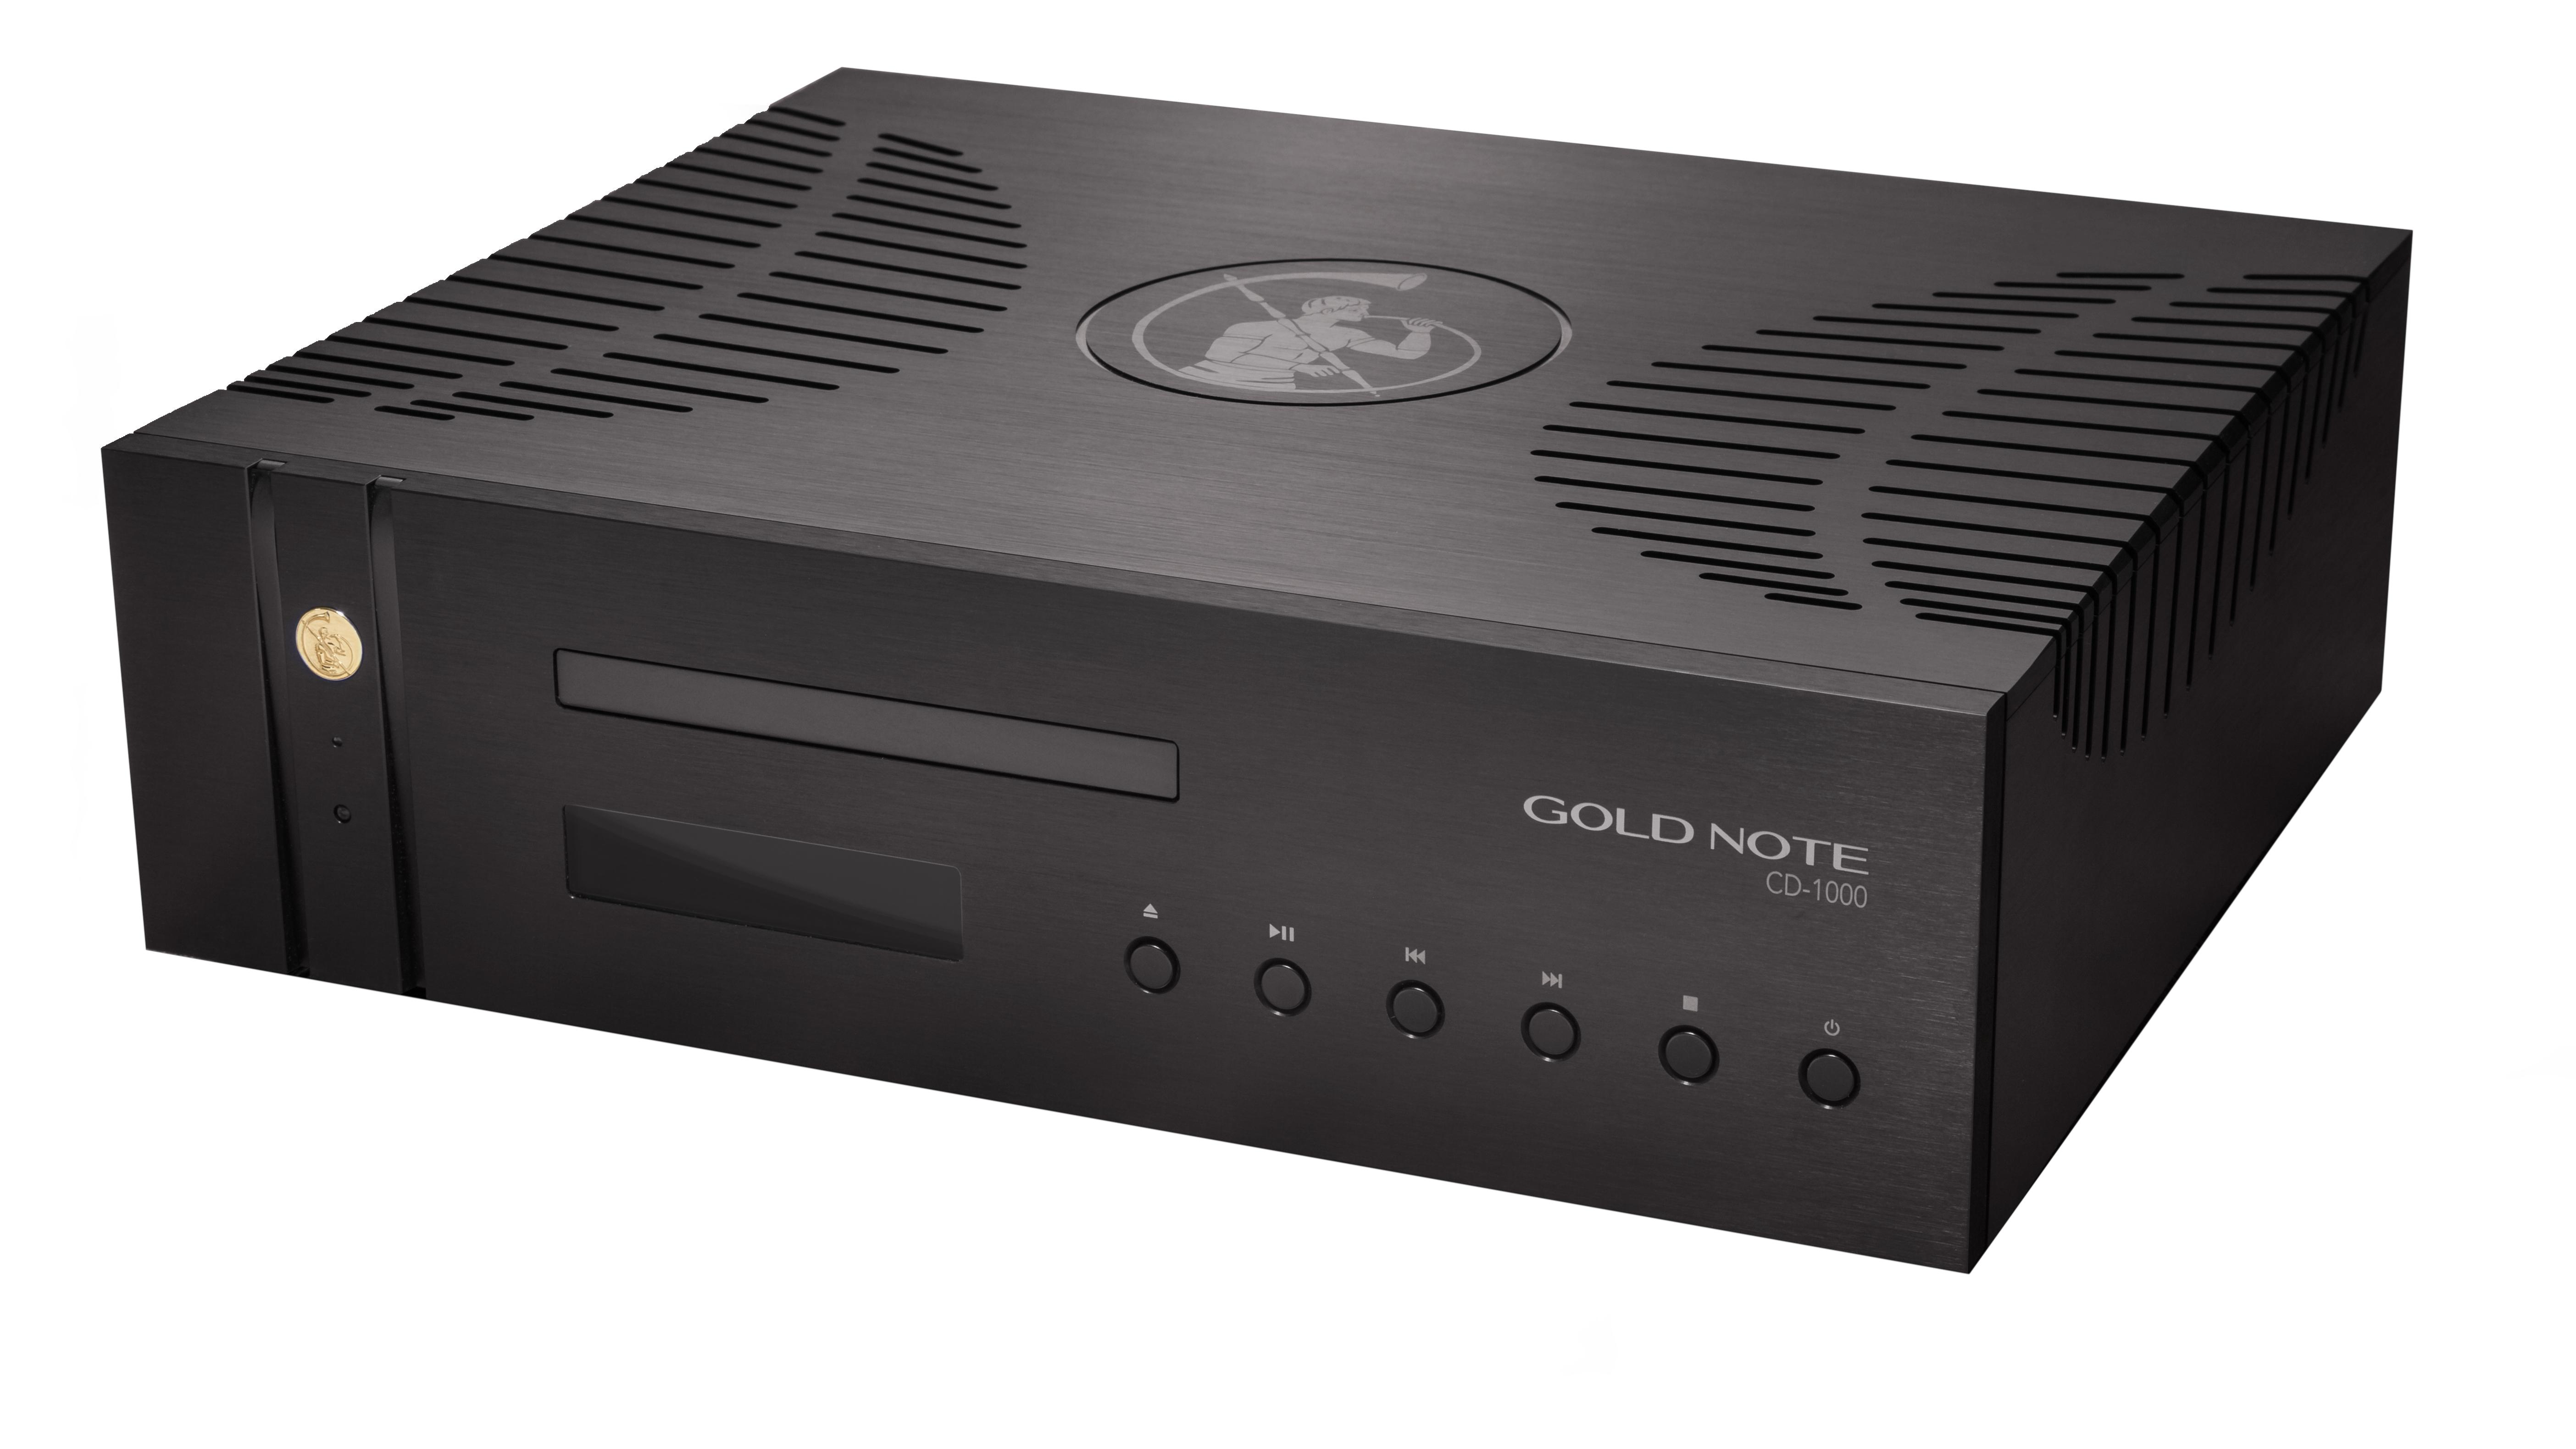 CD-1000 black